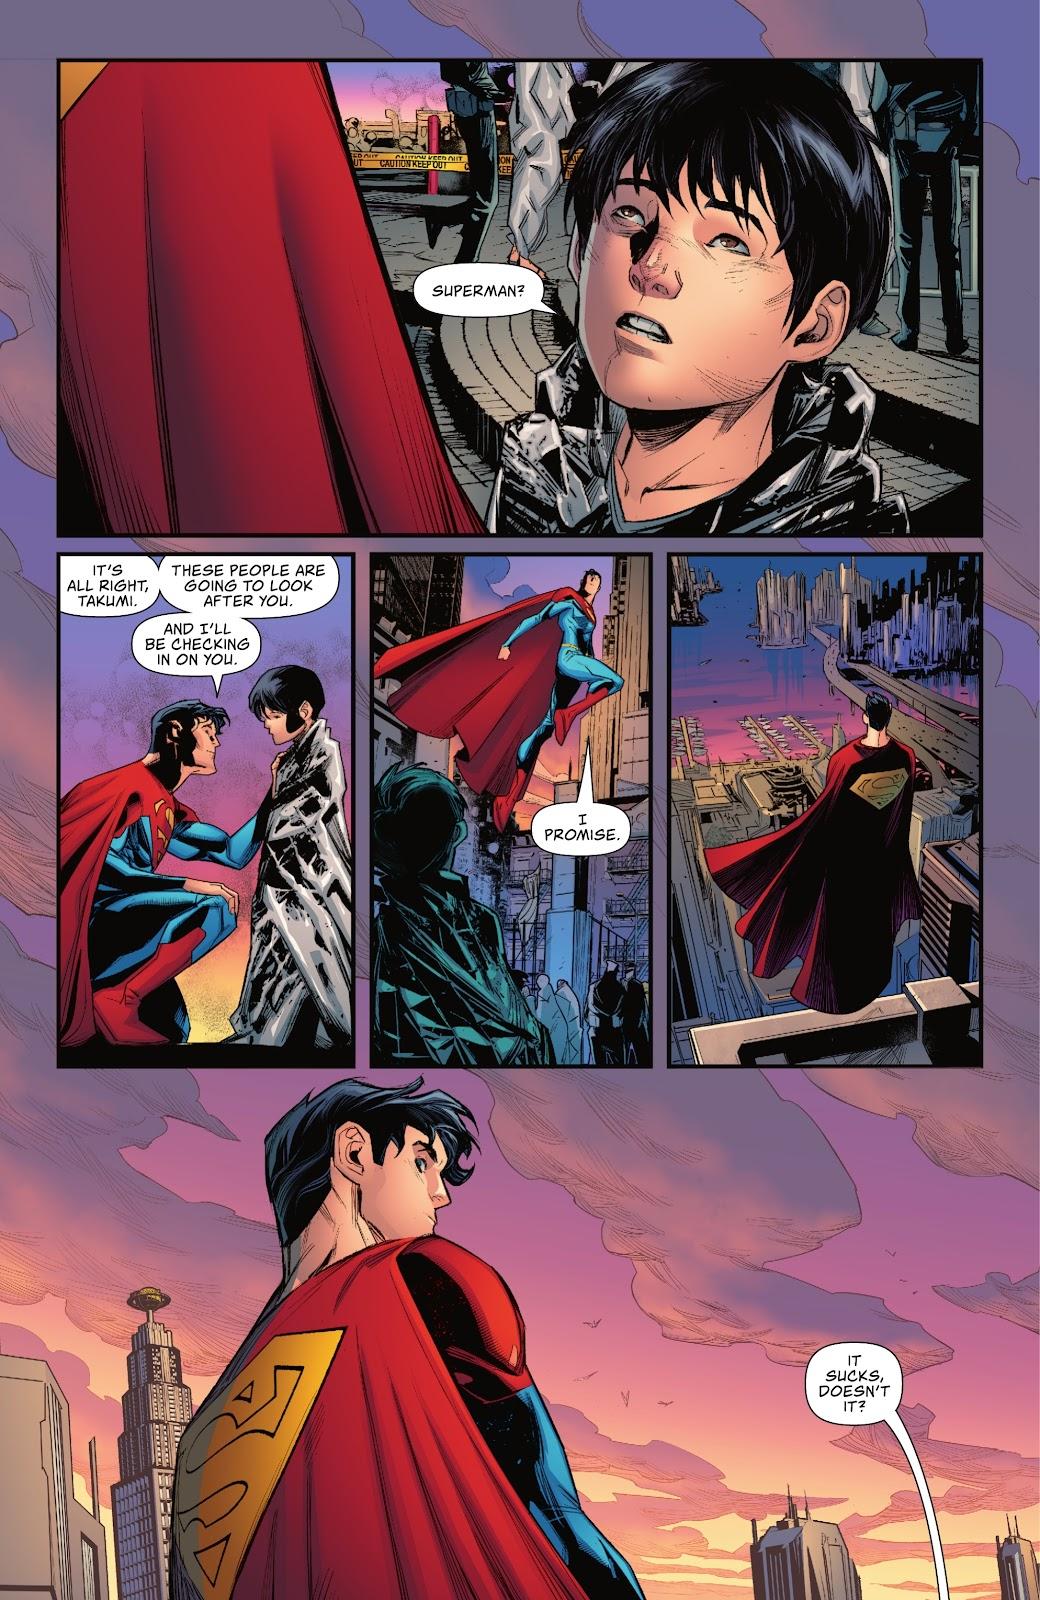 Superman (Jonathan Kent) Rescues Refugees